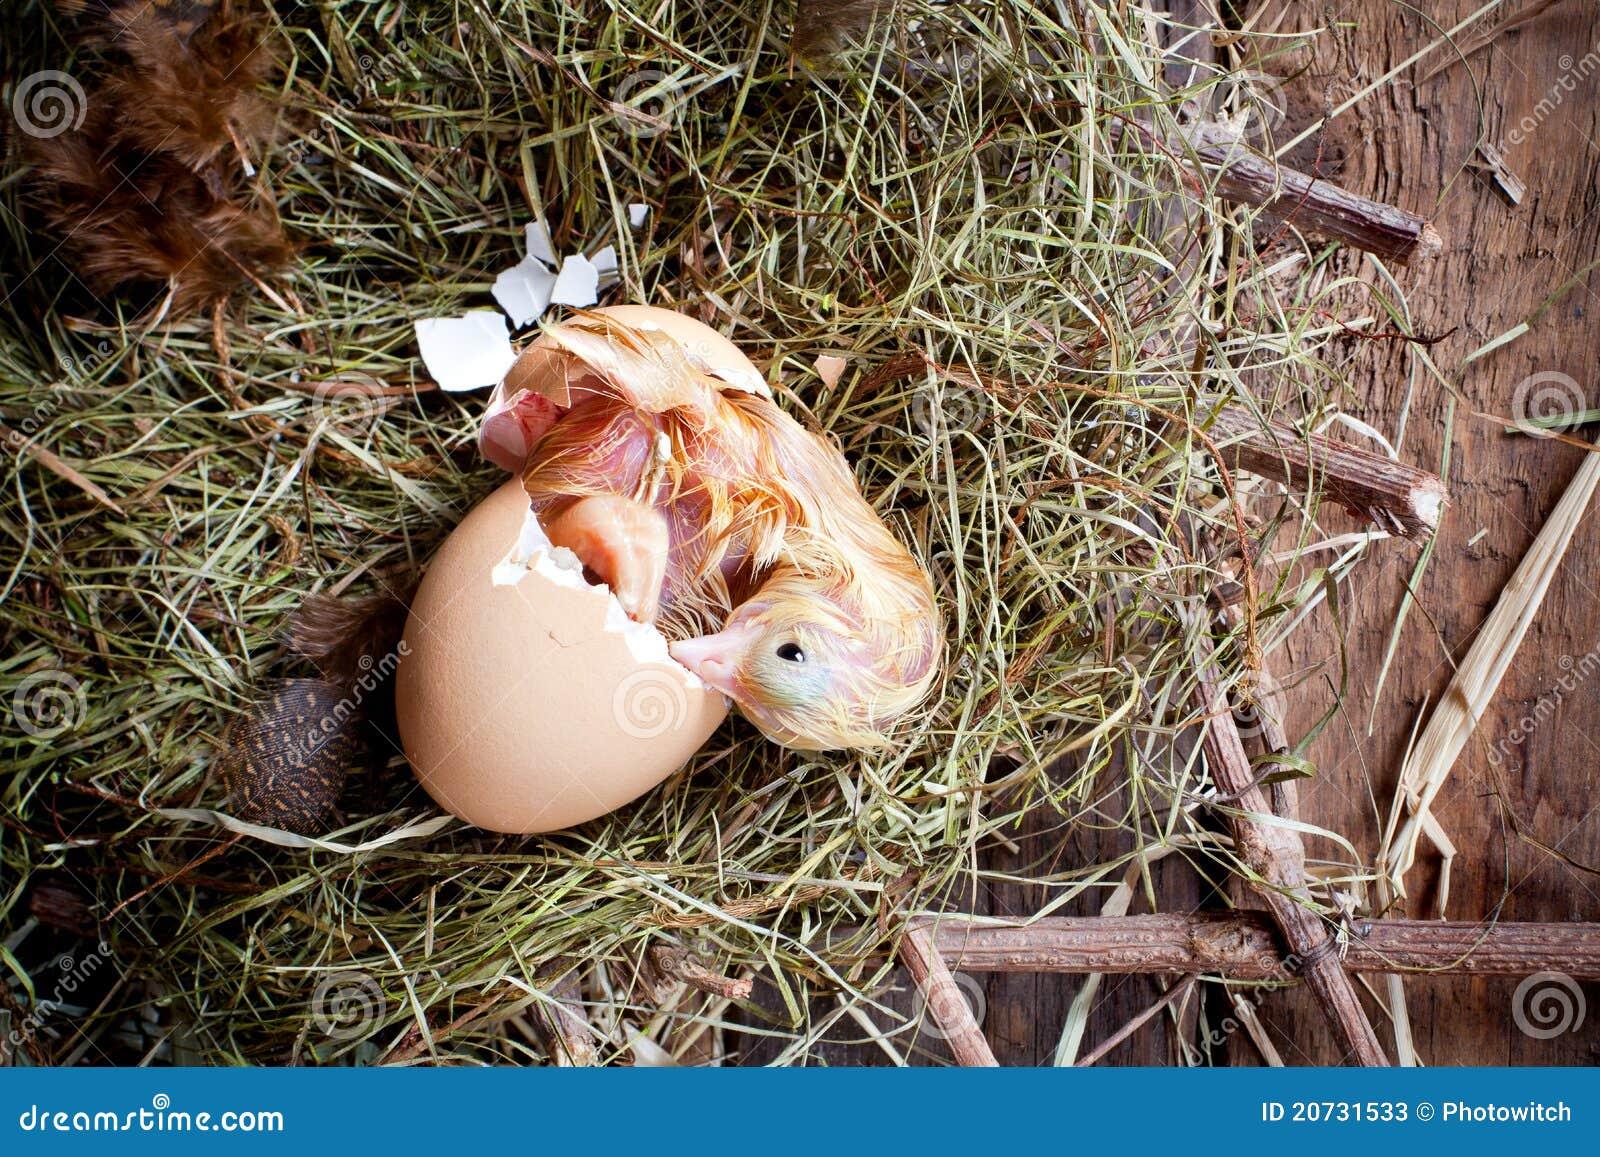 yellow chick birth stock photos